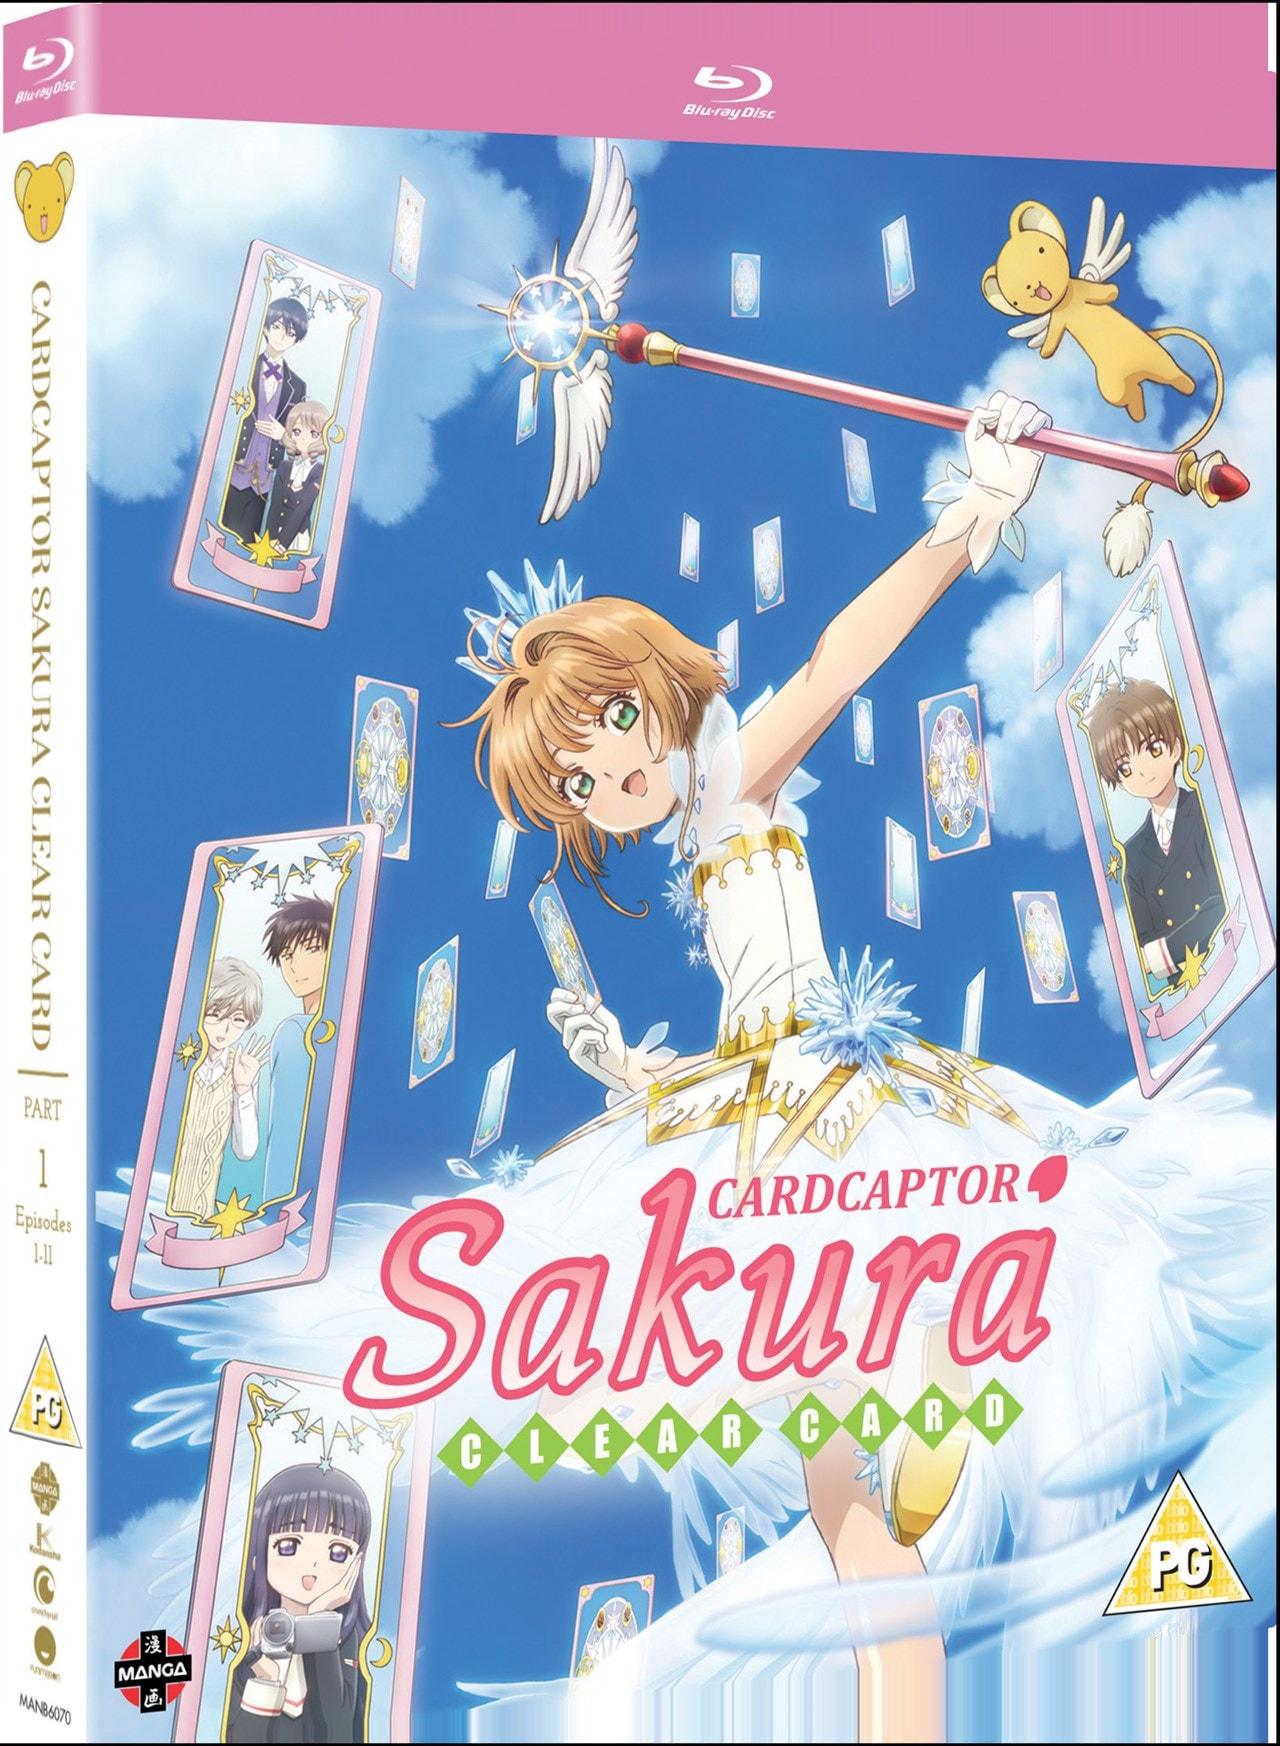 Cardcaptor Sakura: Clear Card - 2